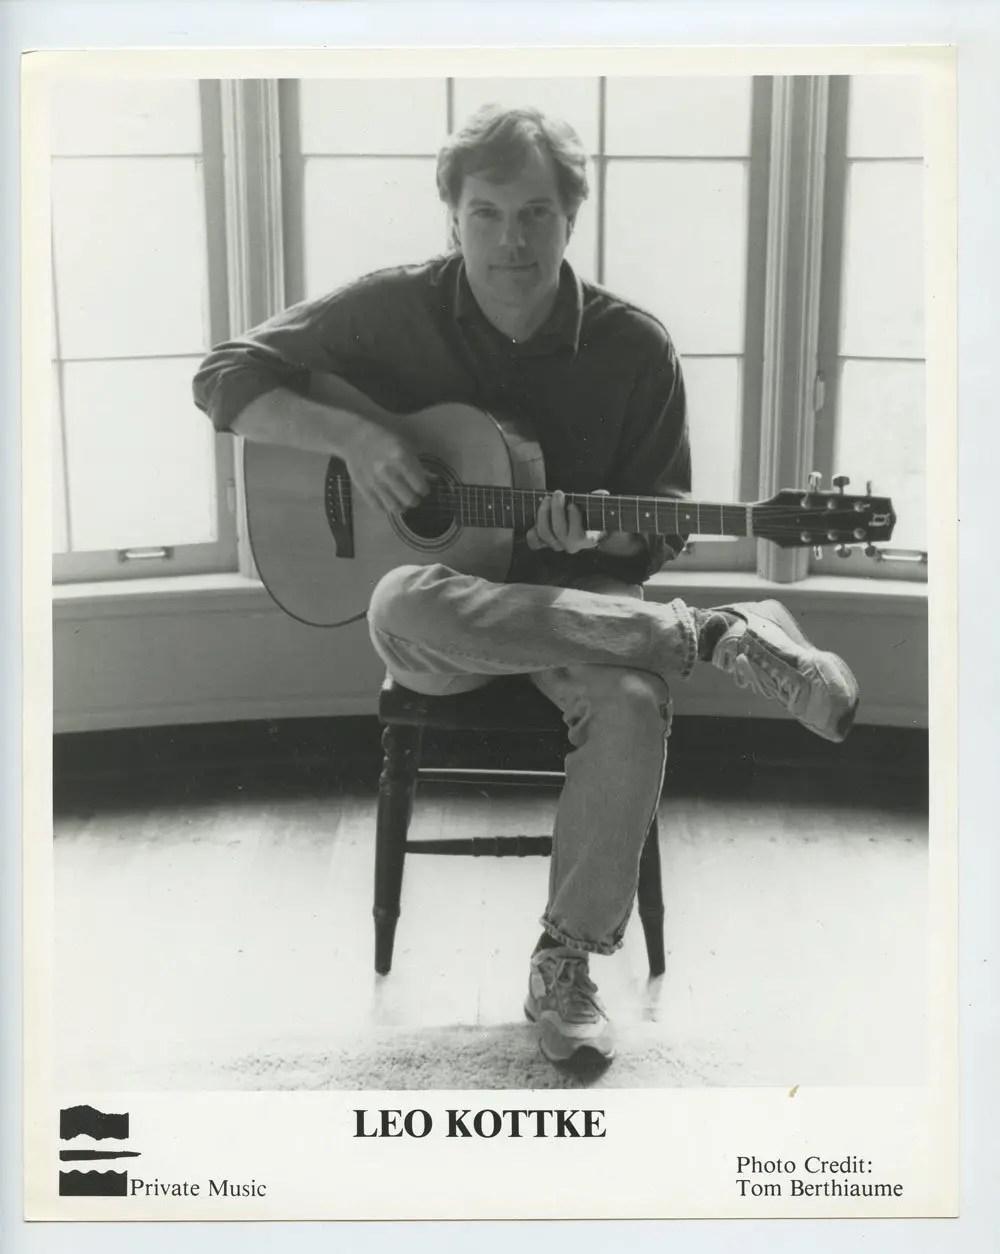 Leo Kottke Photo 1986 Publicity Promo Private Music